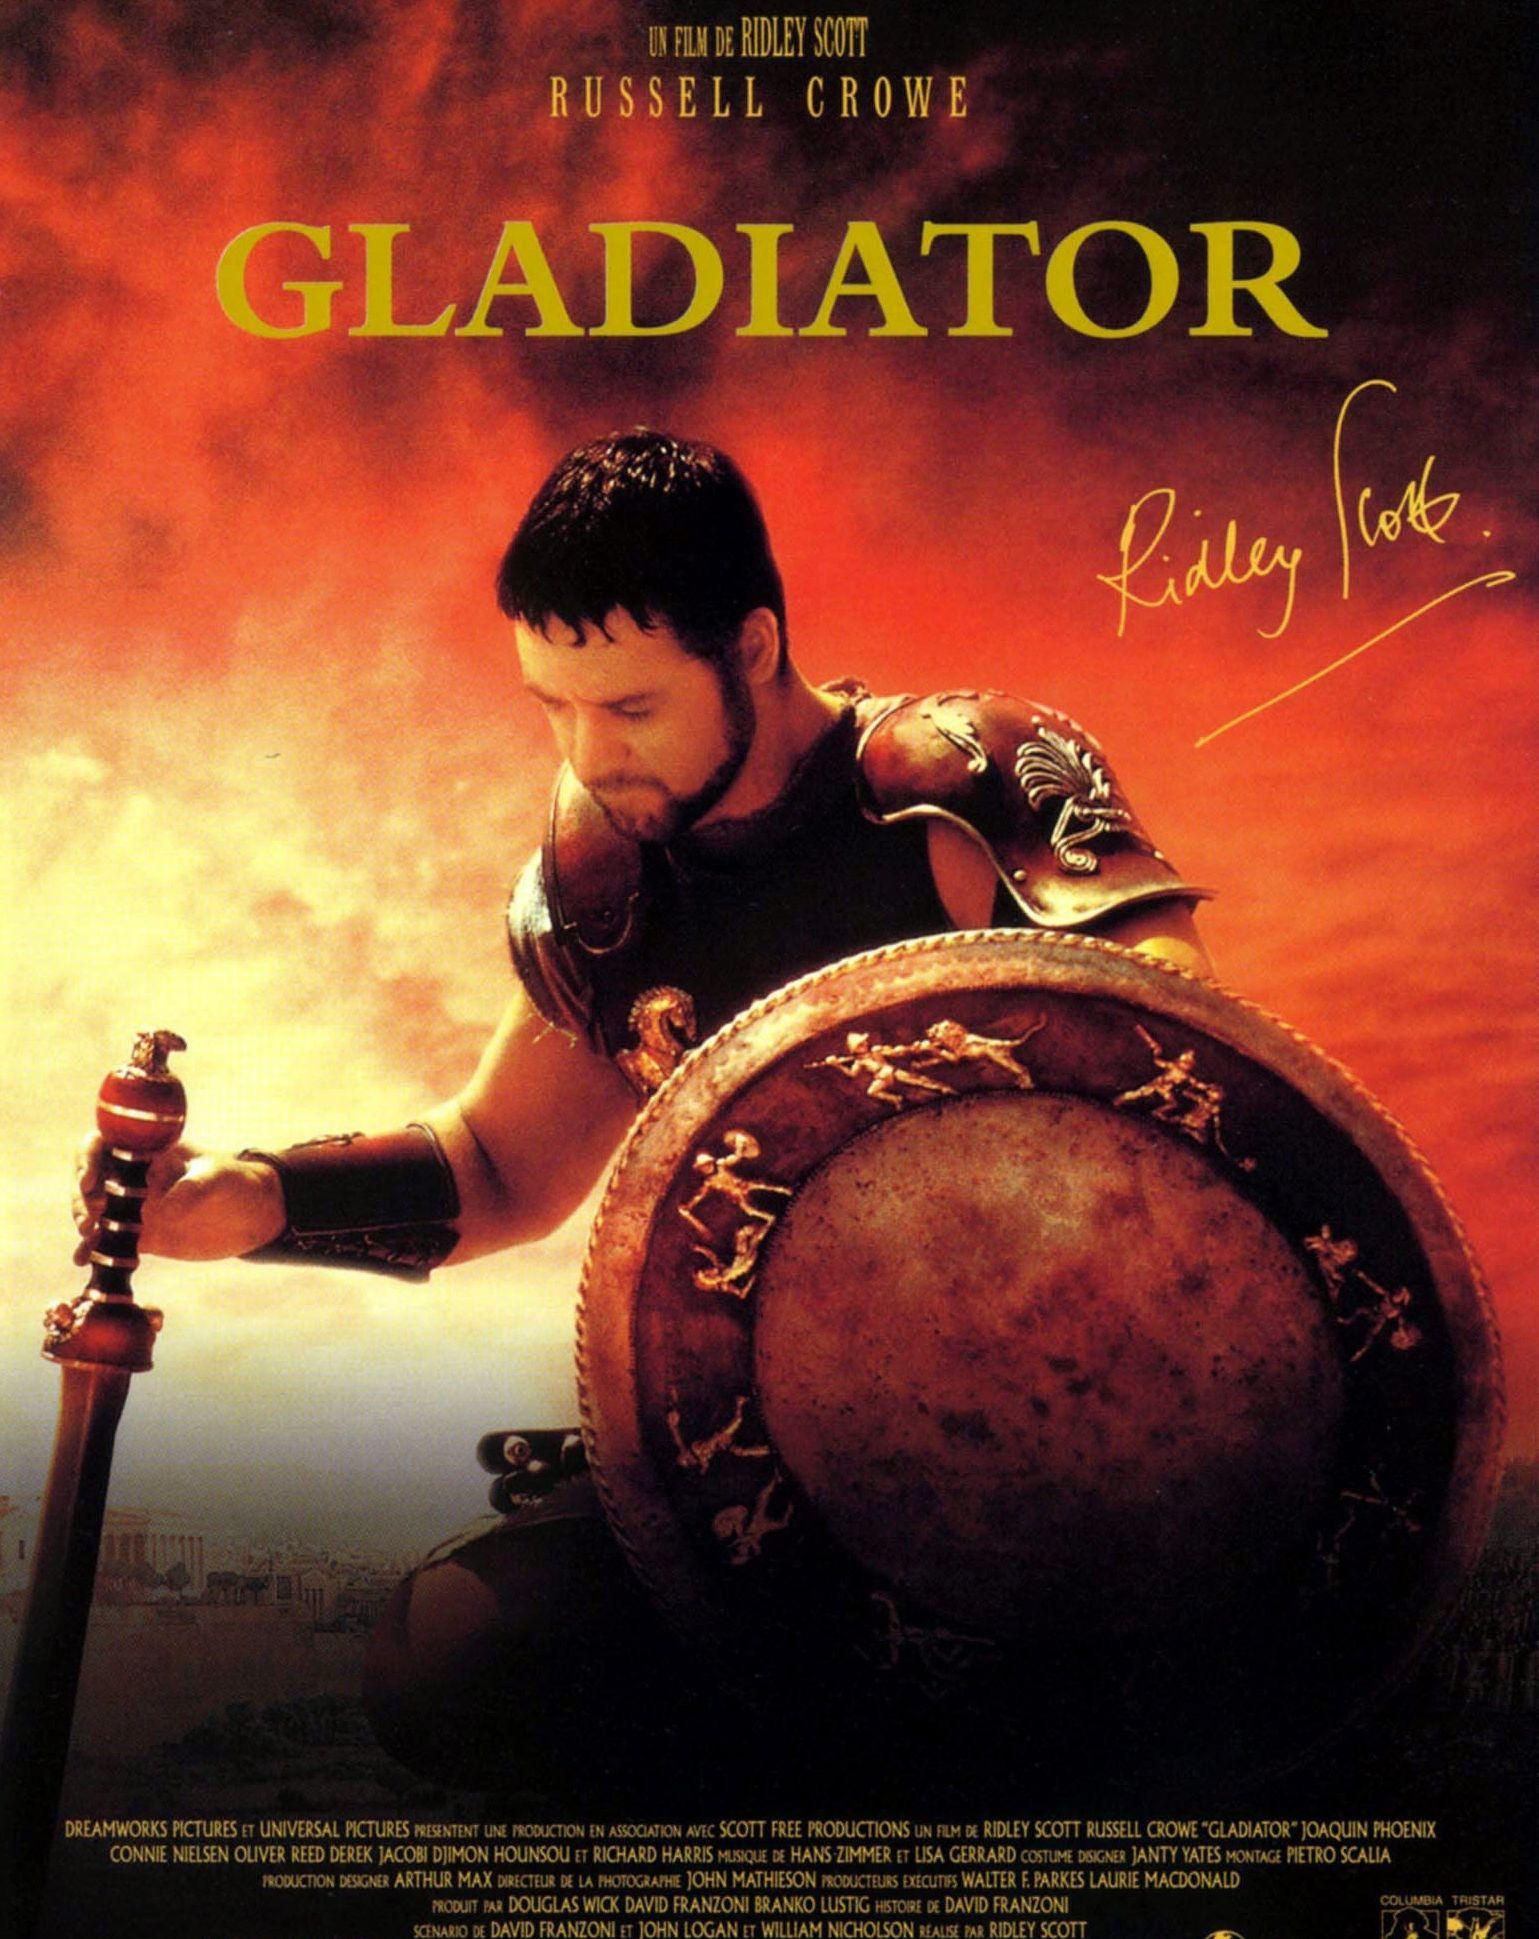 Gladiator - film 1999 | Autres affiches de Cinéma | Pinterest | Films, David hemmings and Oliver ...